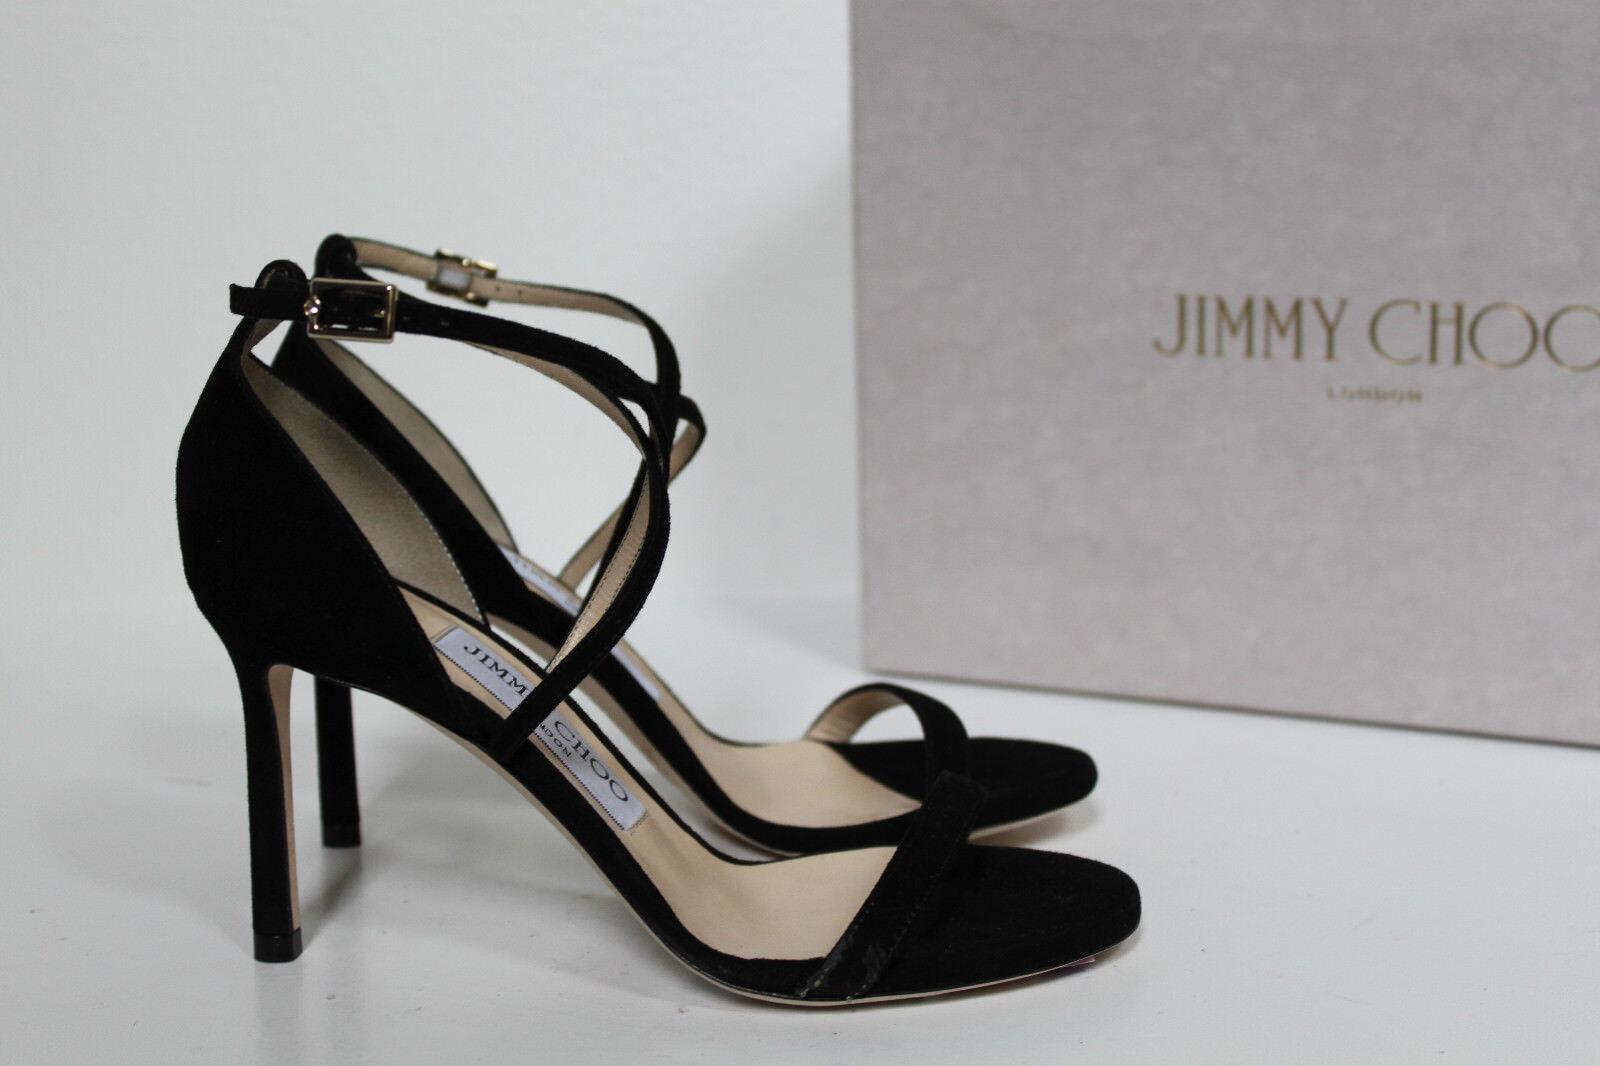 Talla 4.5 4.5 4.5 34.5 Jimmy Choo Hesper Negro Gamuza entrecruzadas de tobillo Abierta Sandalia Zapatos  sin mínimo